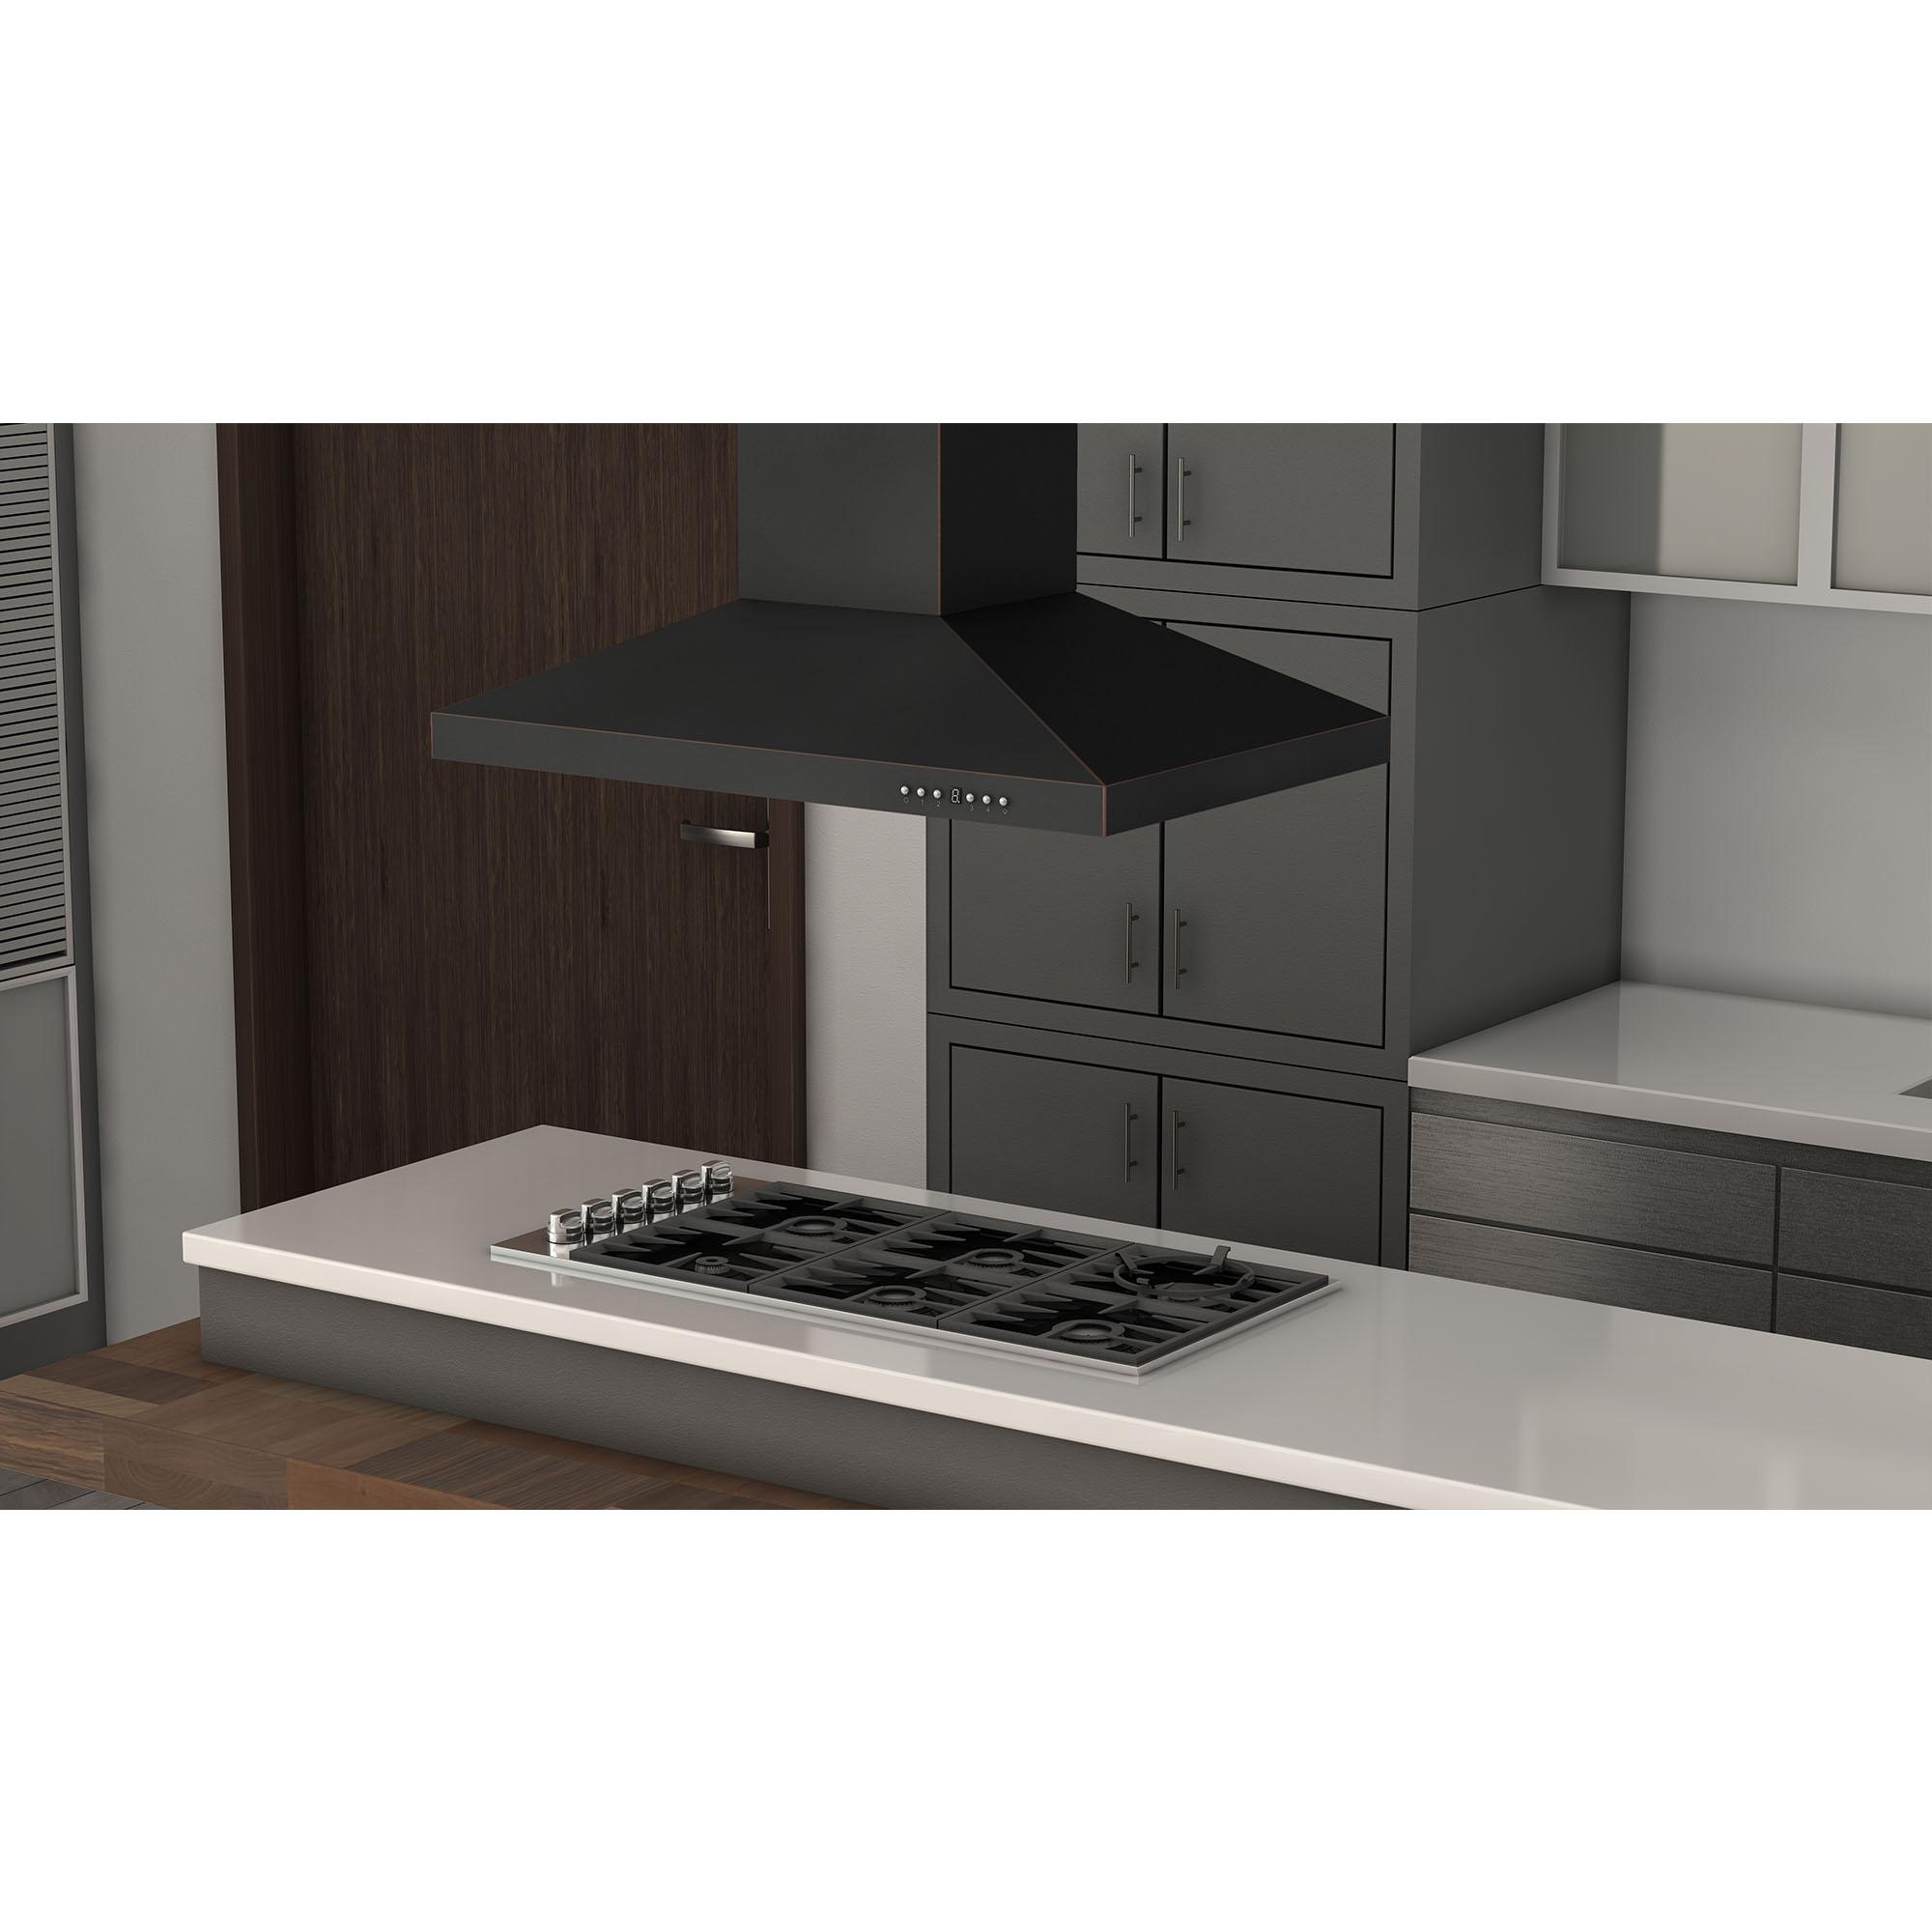 zline-copper-island-mounted-range-hood-8KL3iBi-cooktopdark-2.jpg